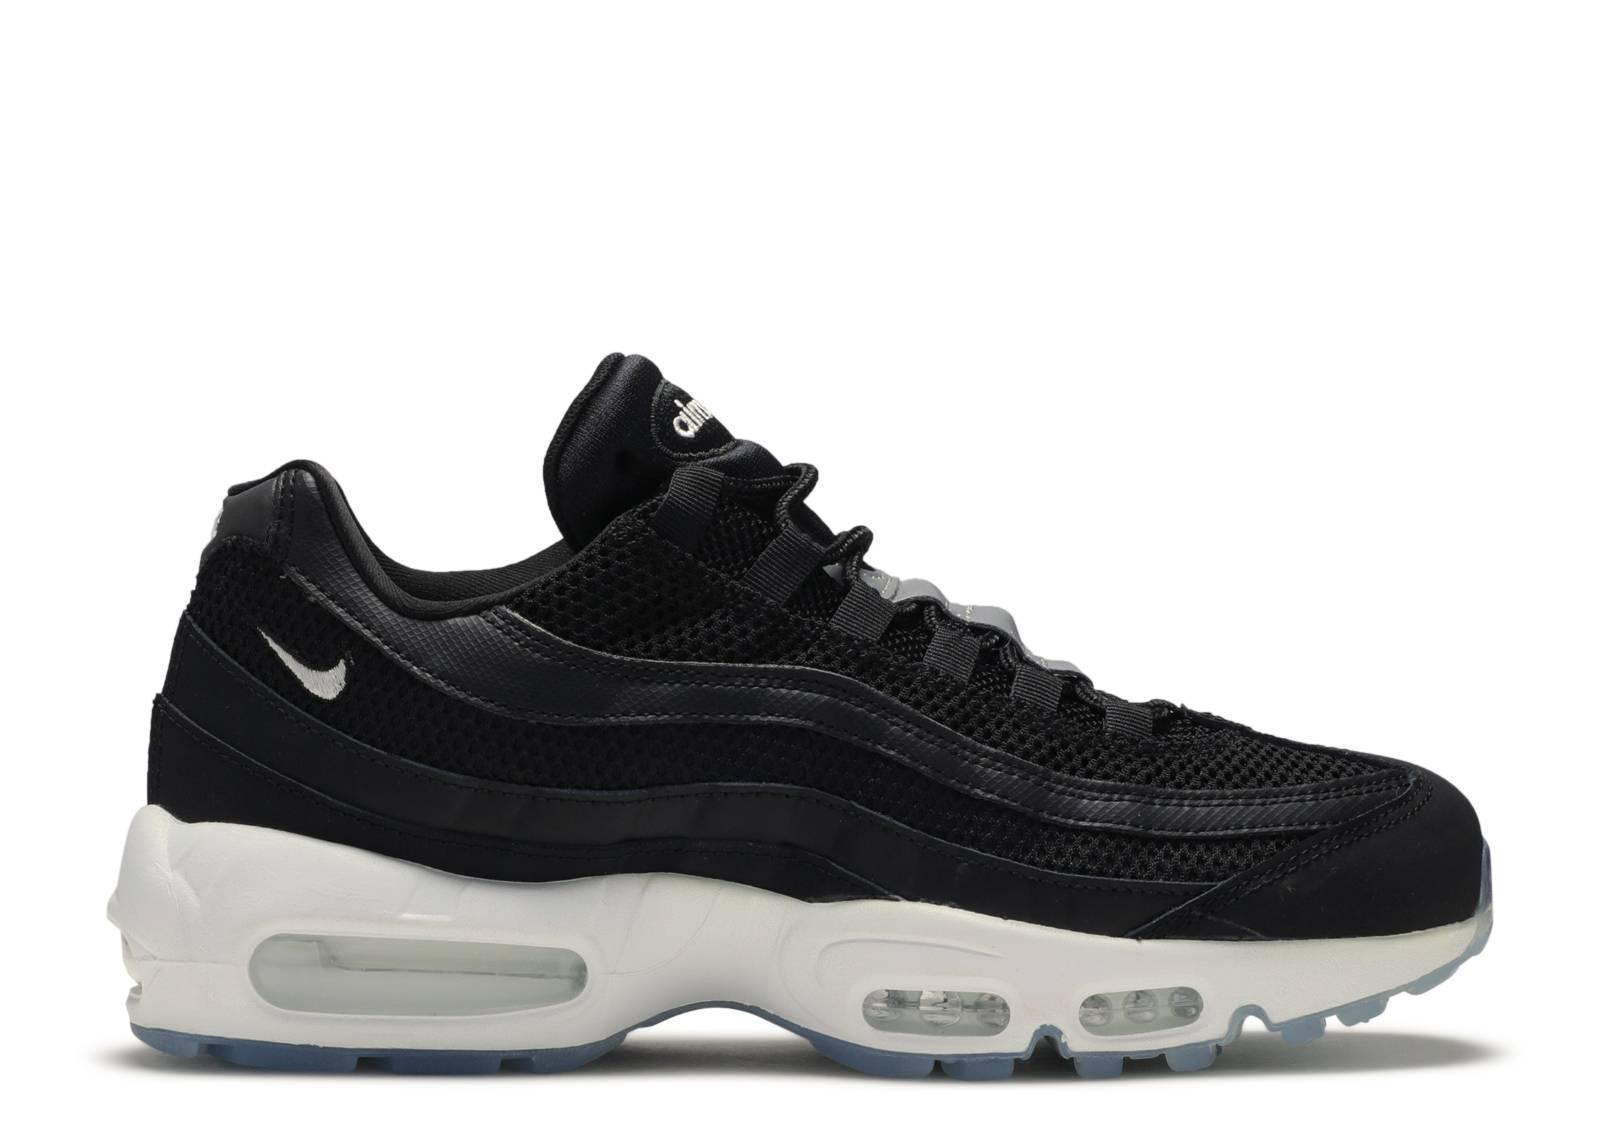 2016 11 749766 022 Nike Air Max 95 Essential Black Men